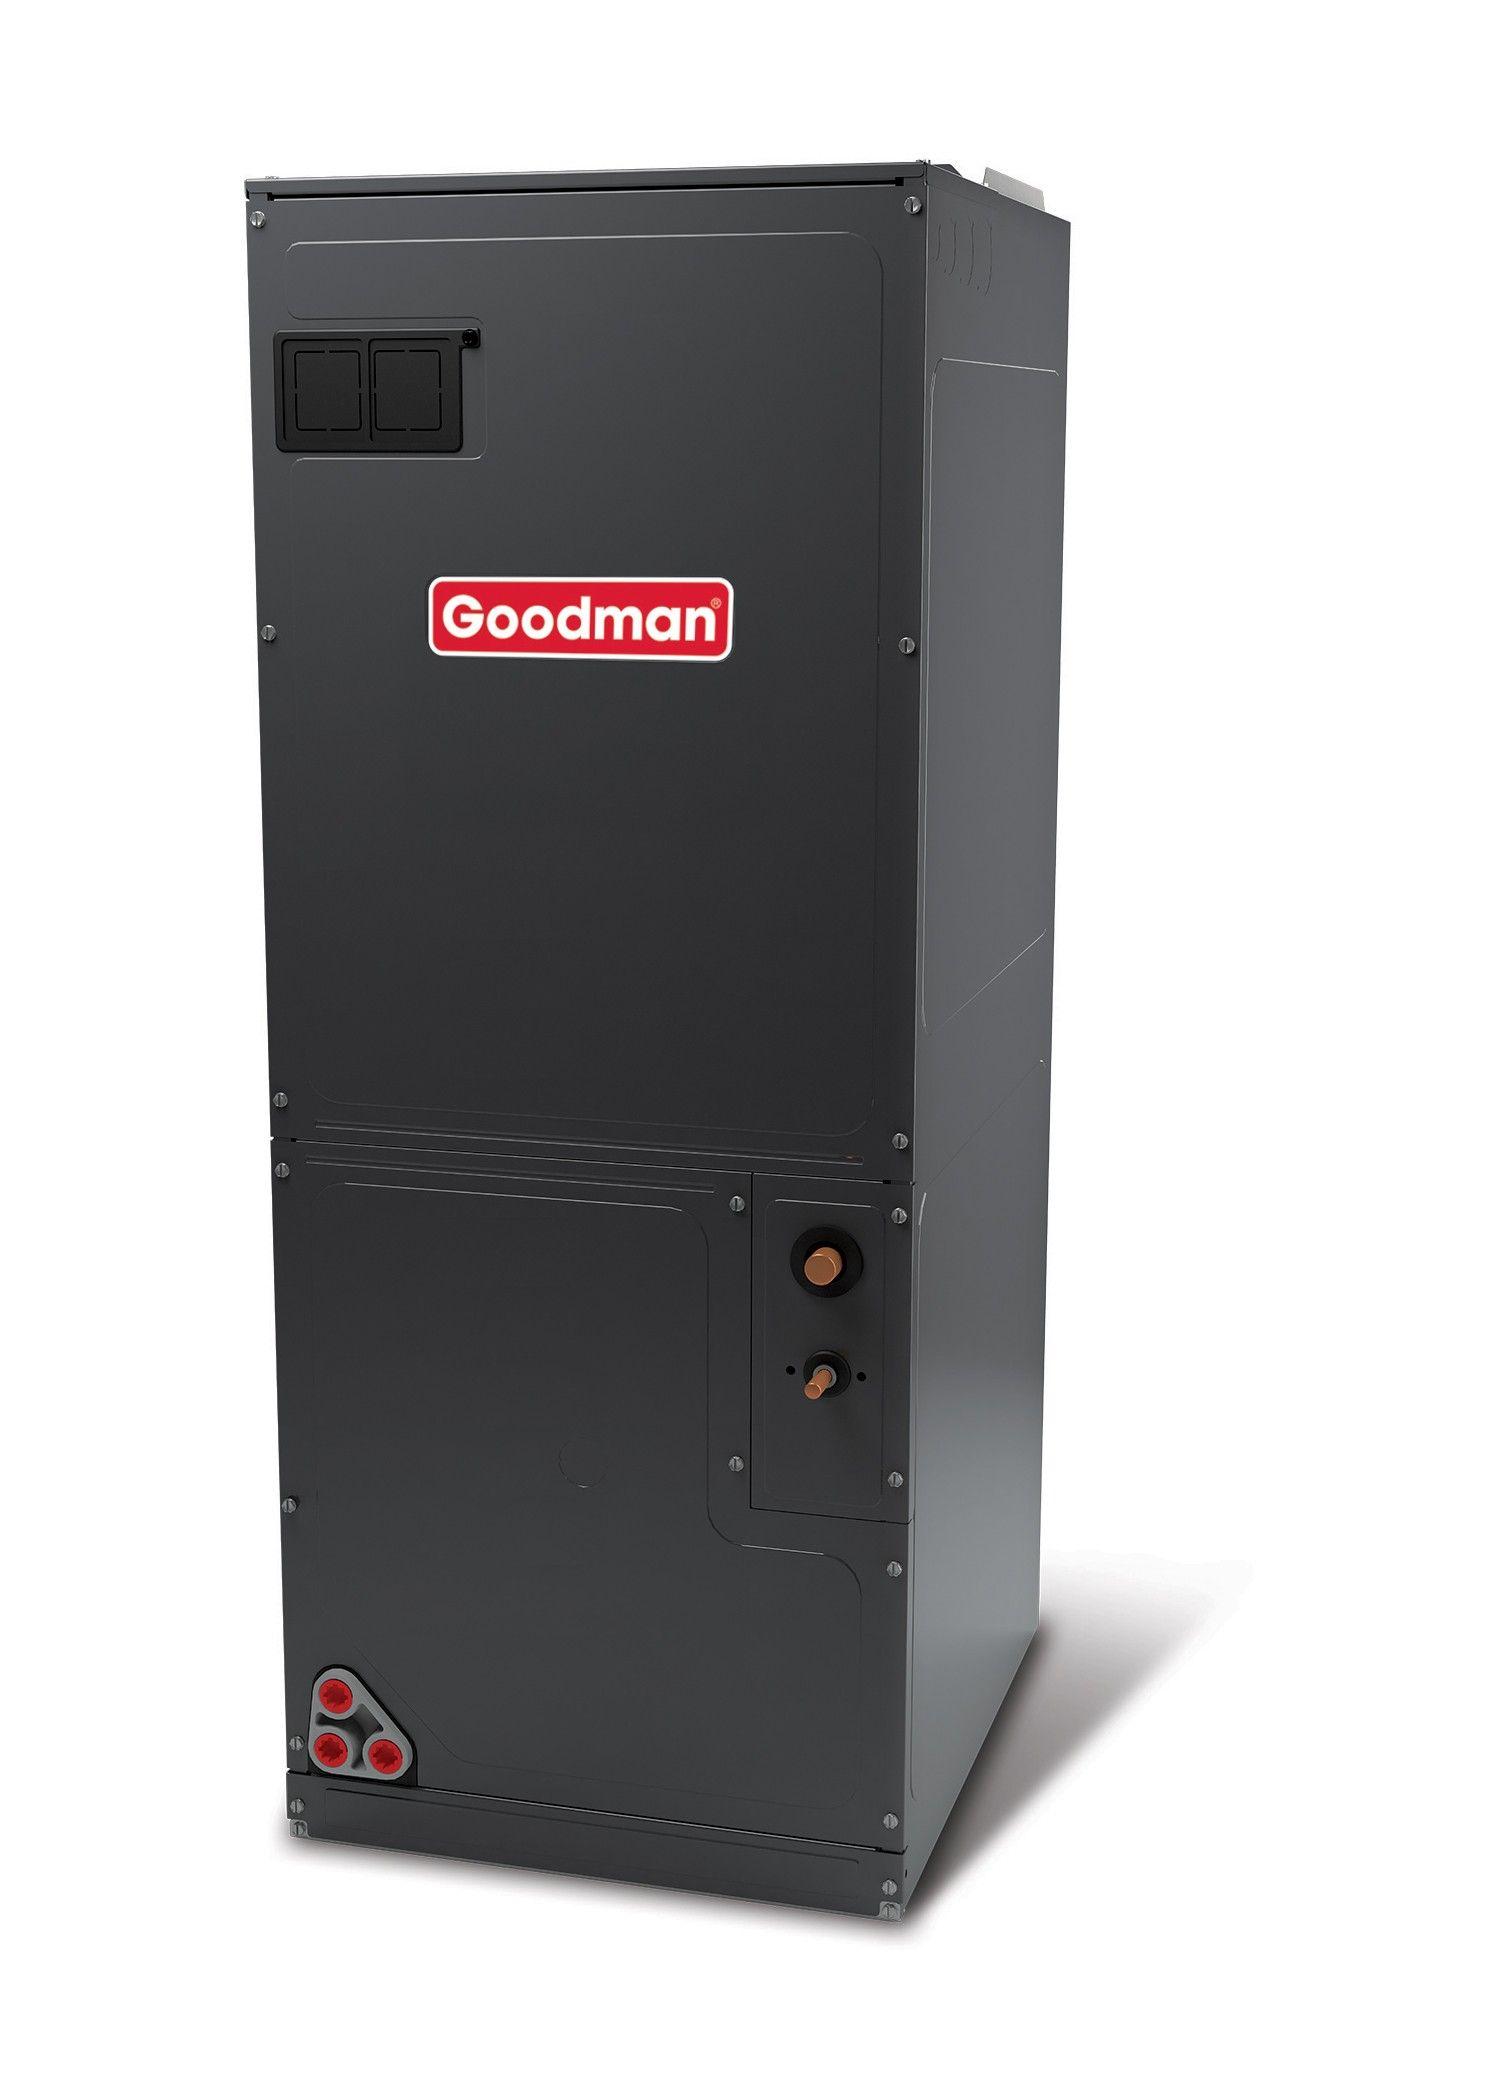 Goodman 5.0 Ton ASPT High-Efficiency Multiposition Air Handler